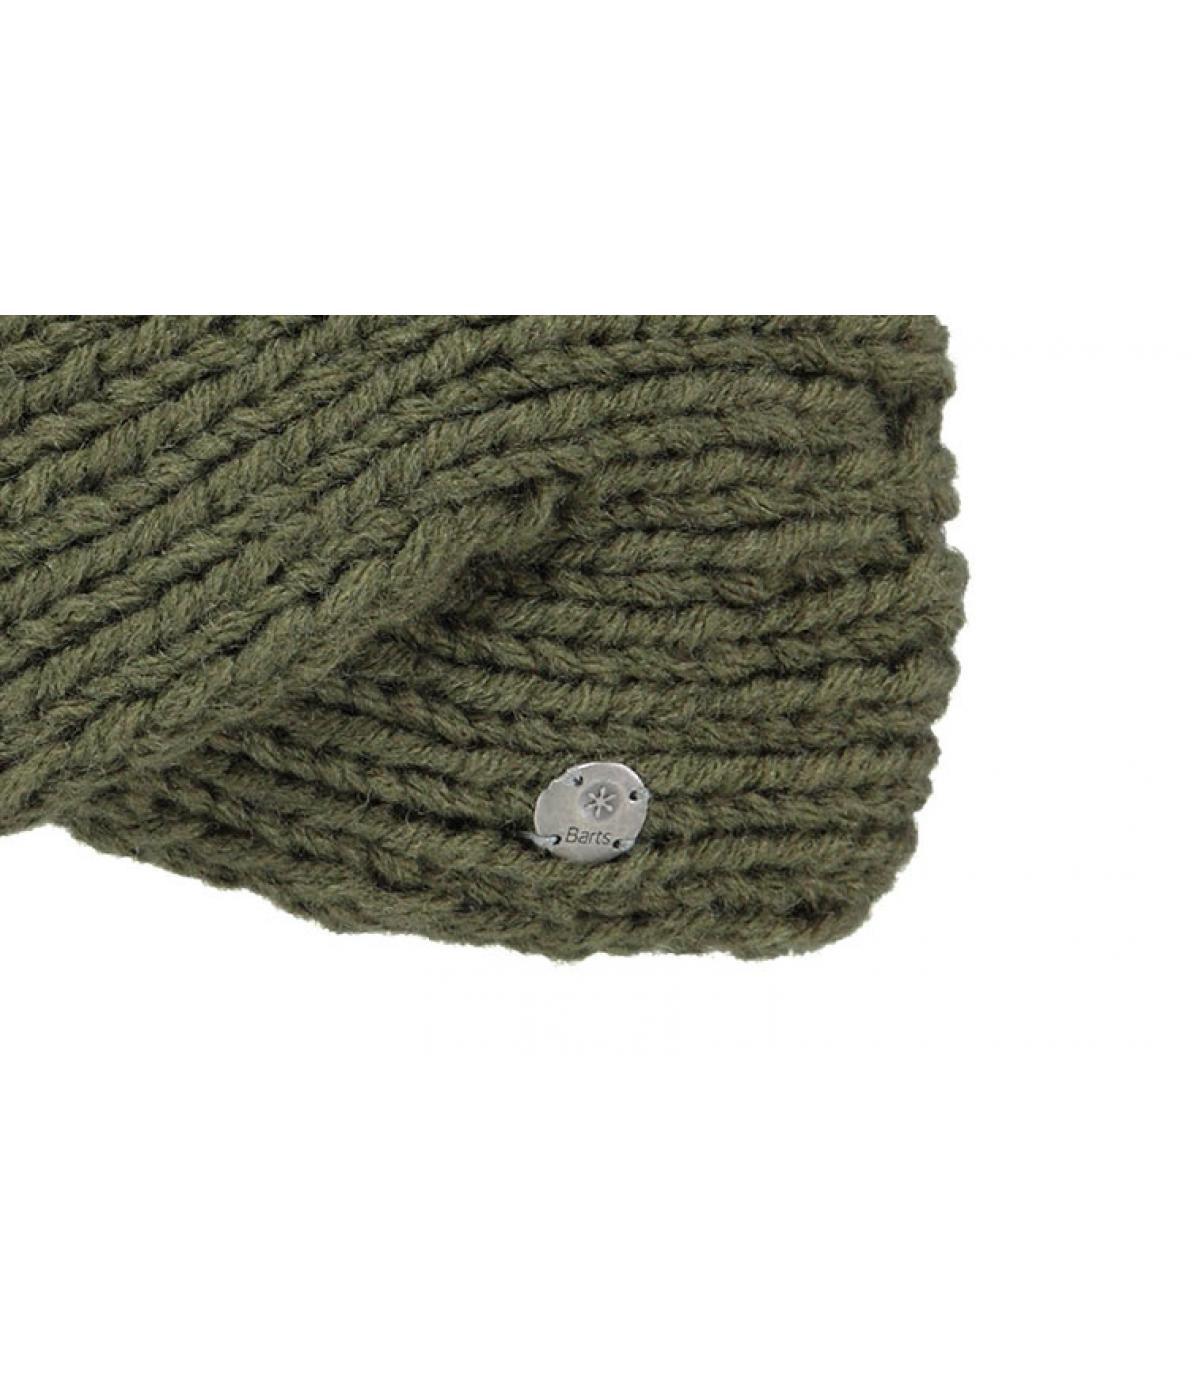 Détails Yogi headband army - image 3